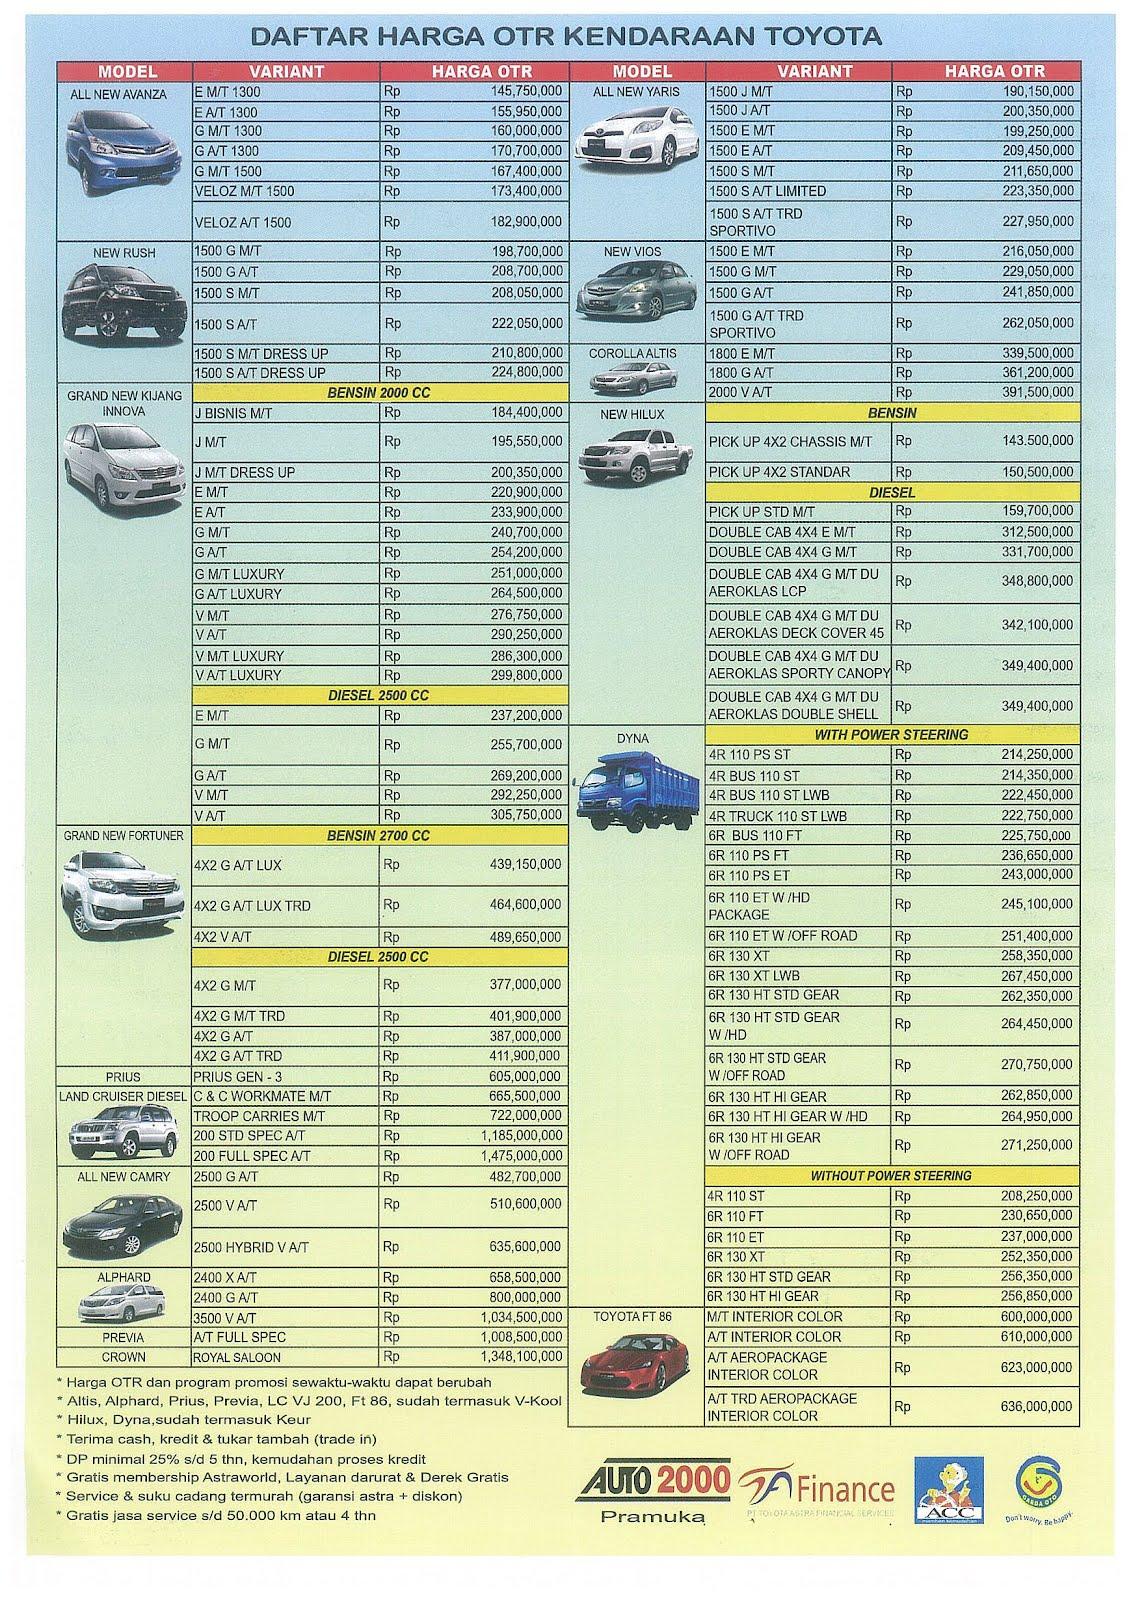 harga grand new avanza surabaya all kijang innova 2.4 v a/t diesel lux toyota agya etios veloz rush